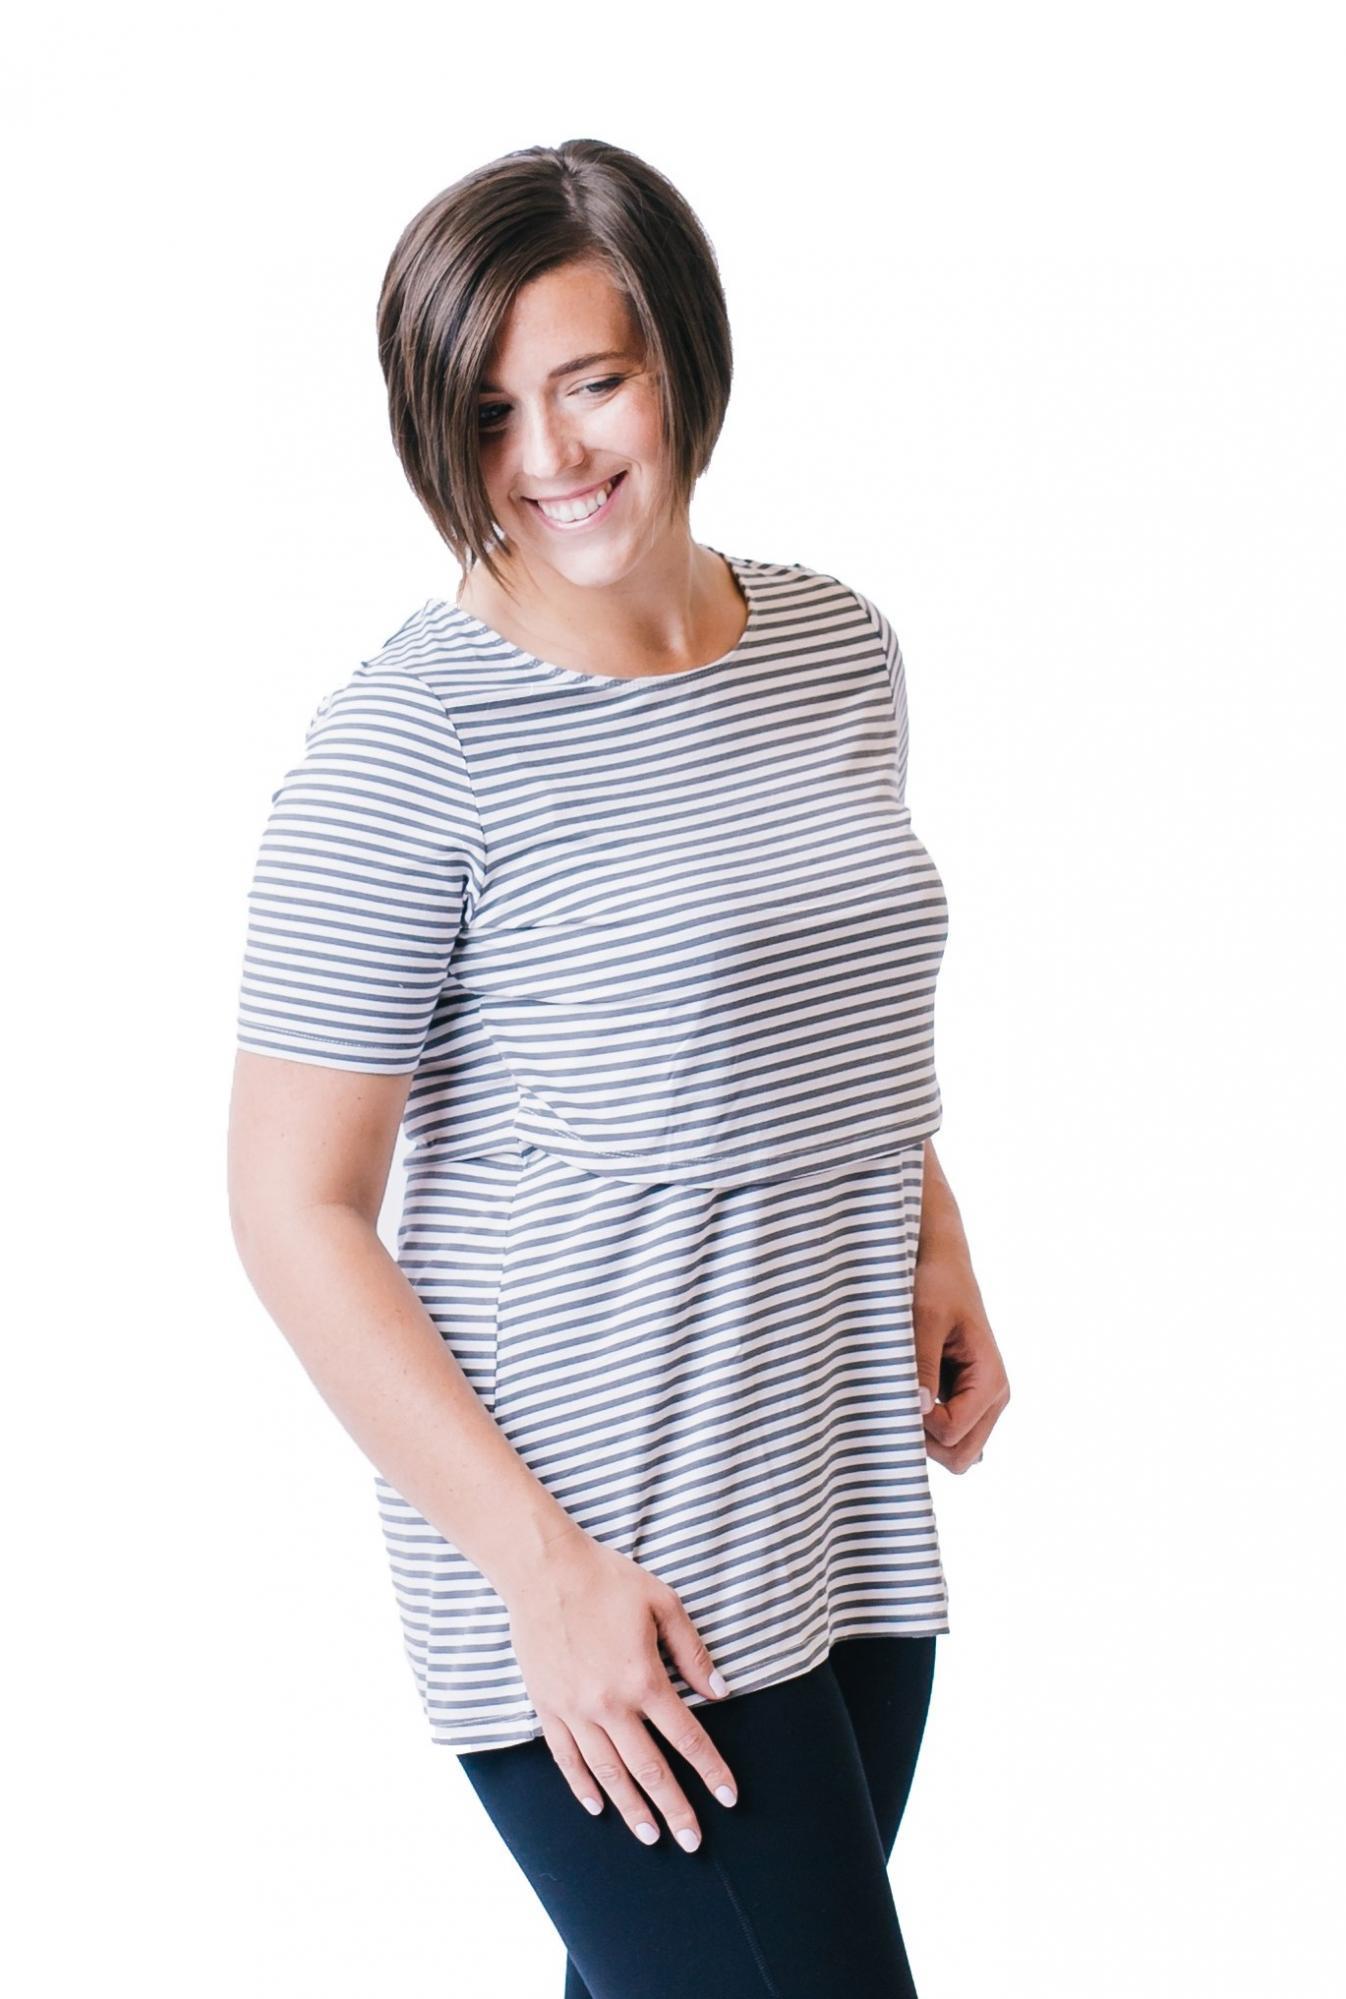 undercover-mama-nursing-t-shirt-striped-4.jpg